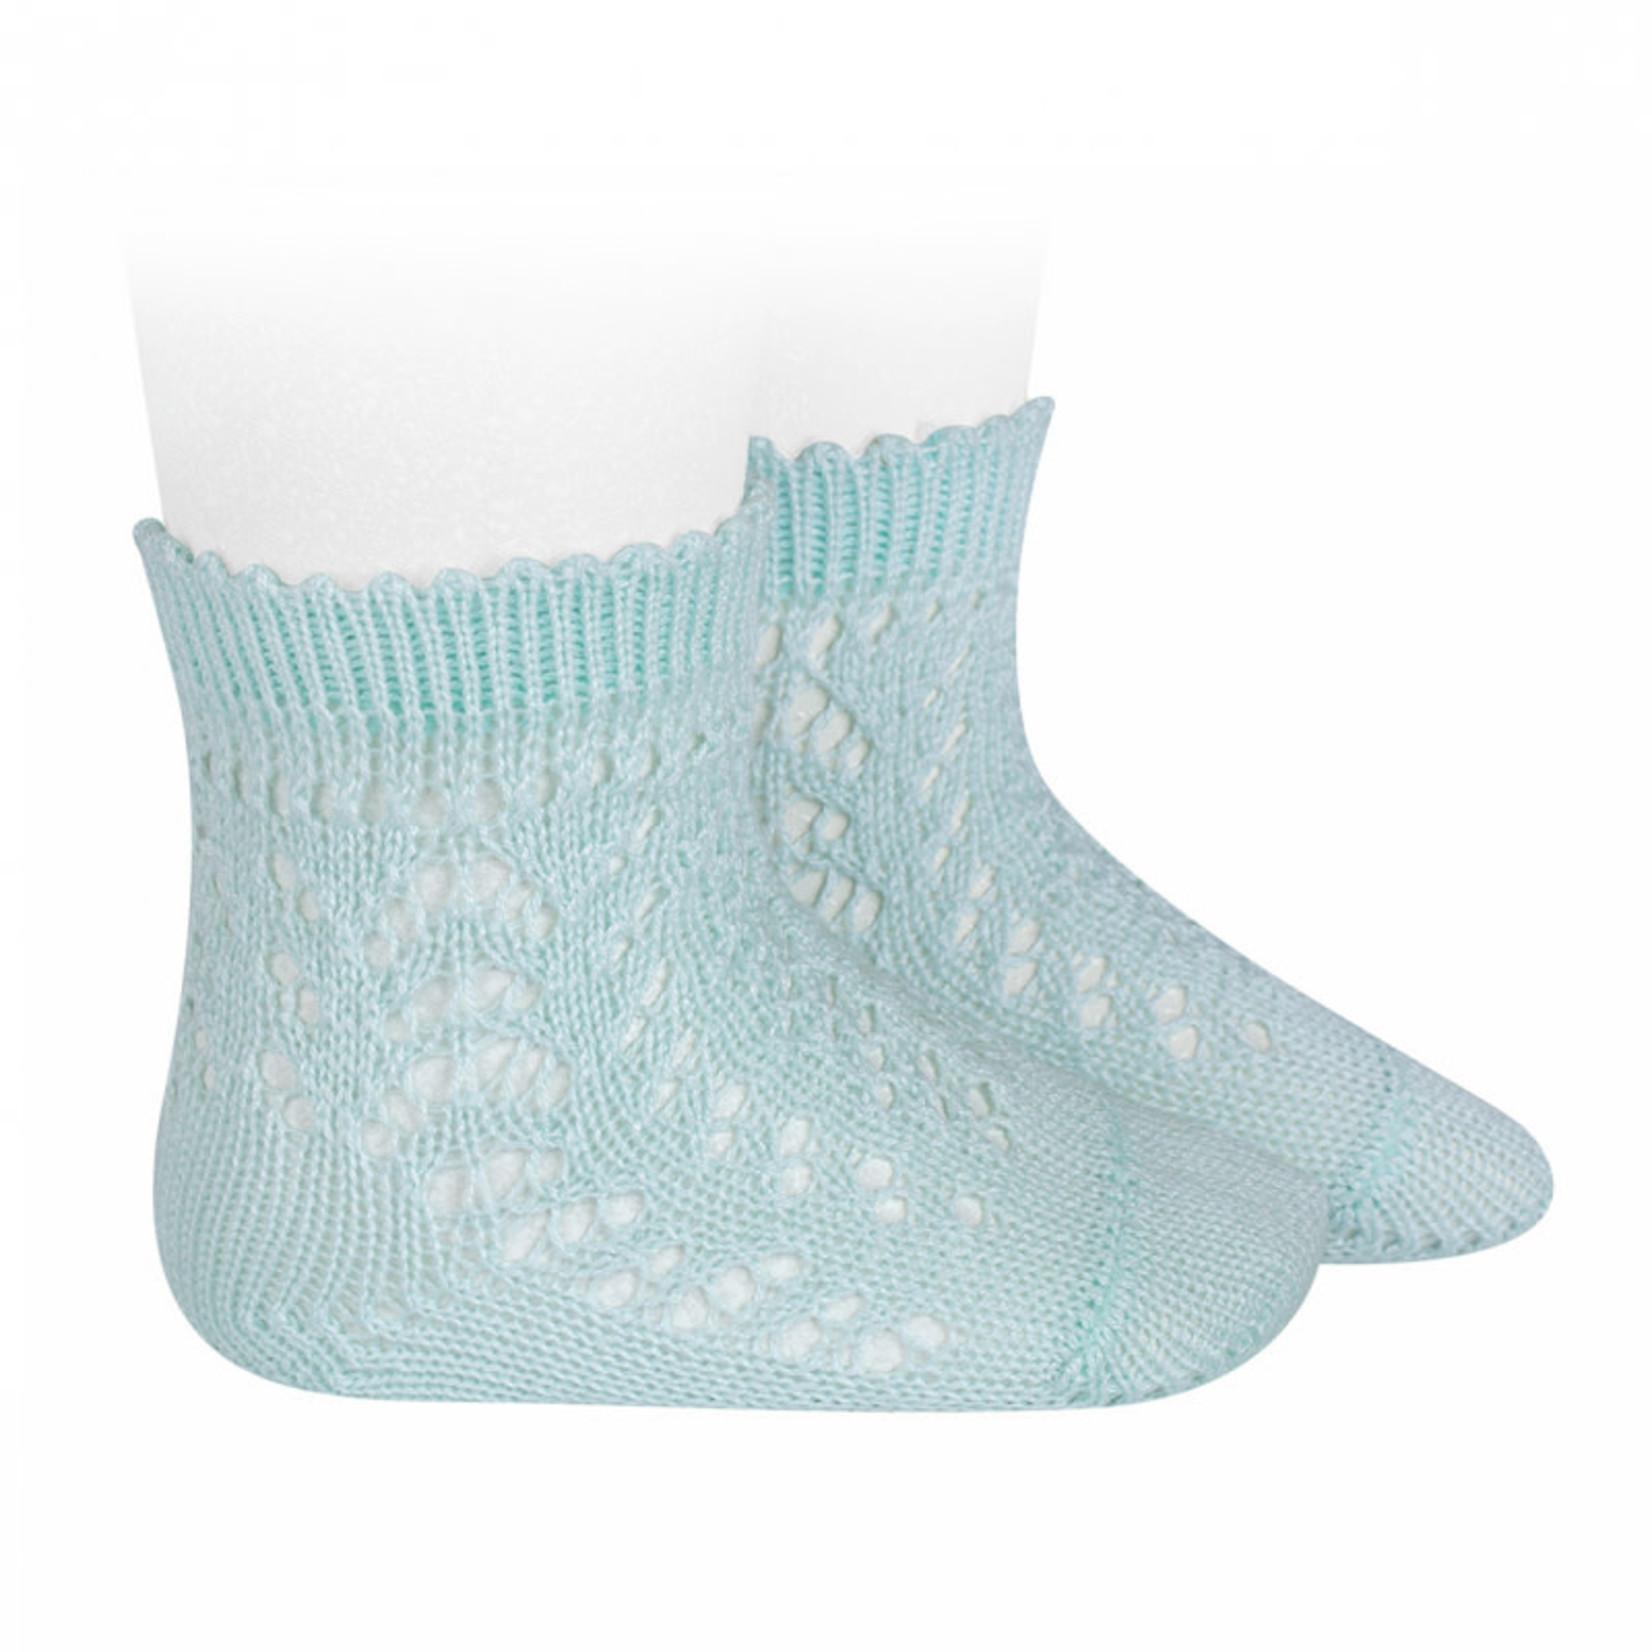 Socks Open - Aquamarine